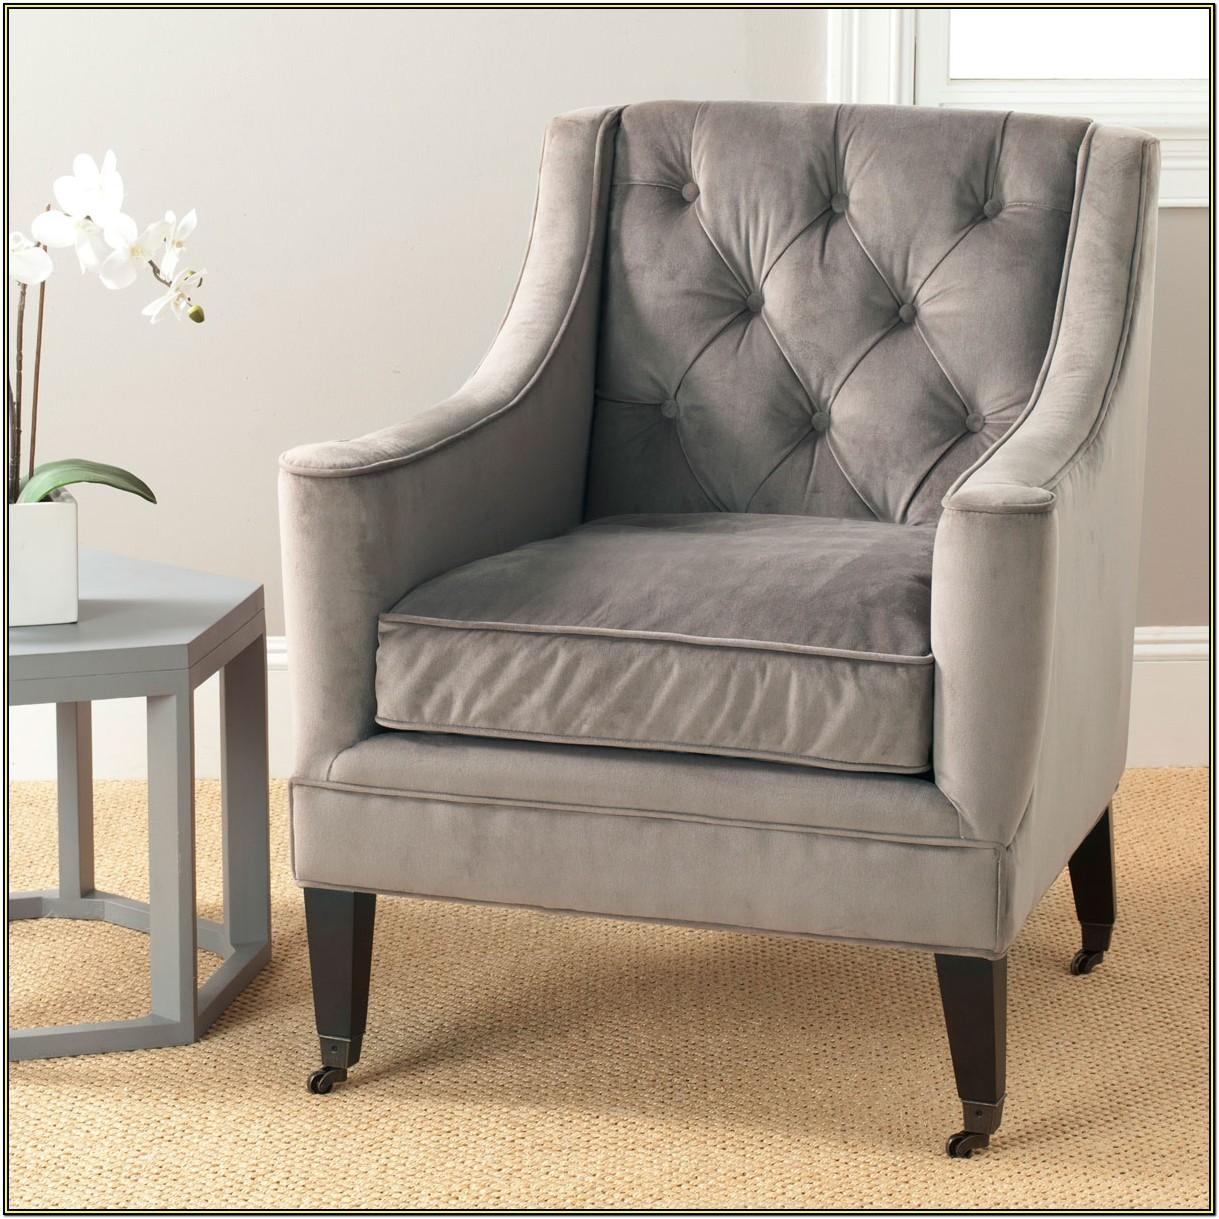 Safavieh Living Room Chairs